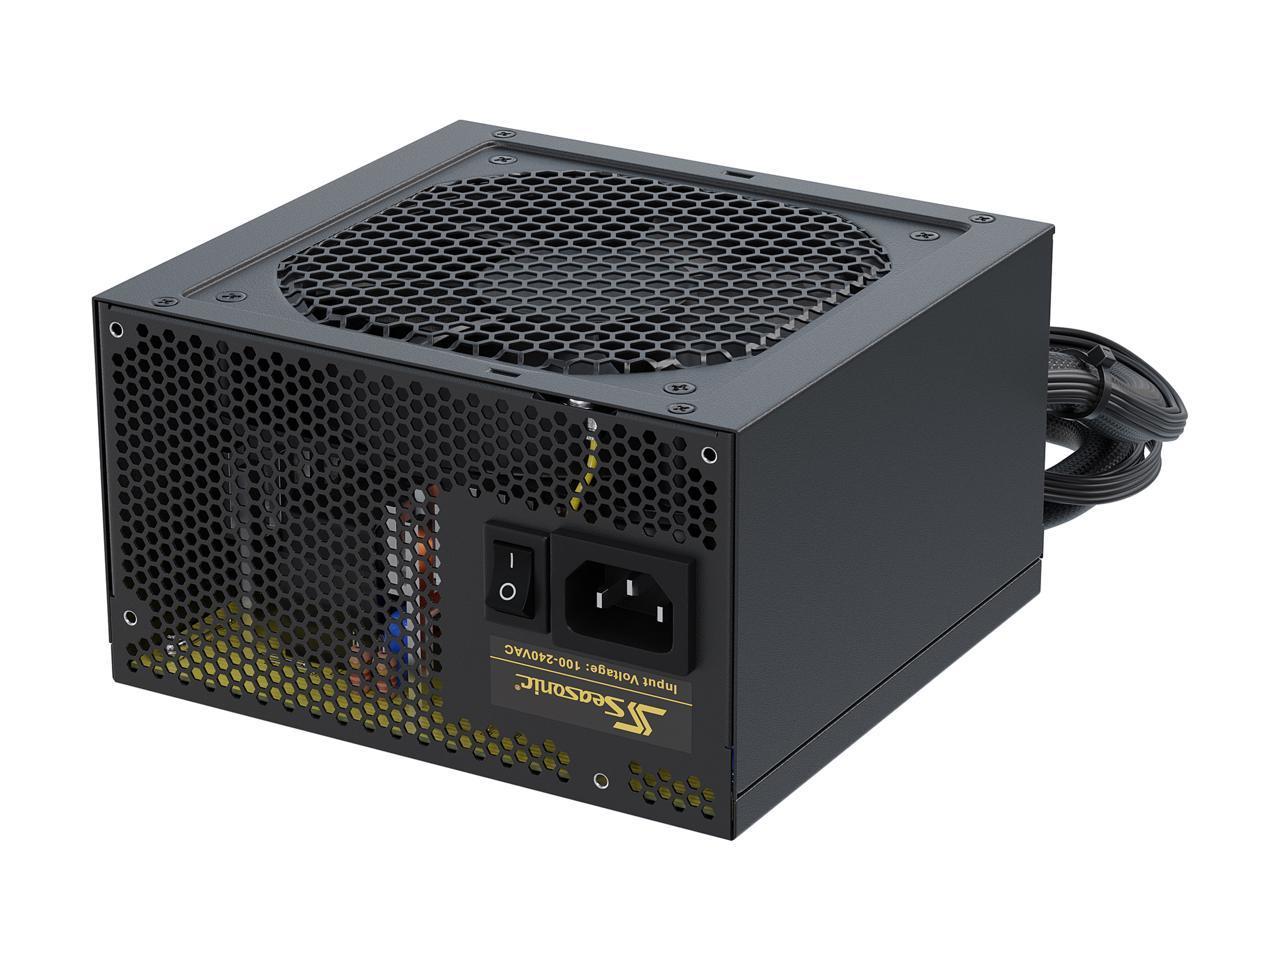 Seasonic Core GM-500 500W 80+ Gold Semi Modular Power Supply @Newegg (no rebate) $59.49